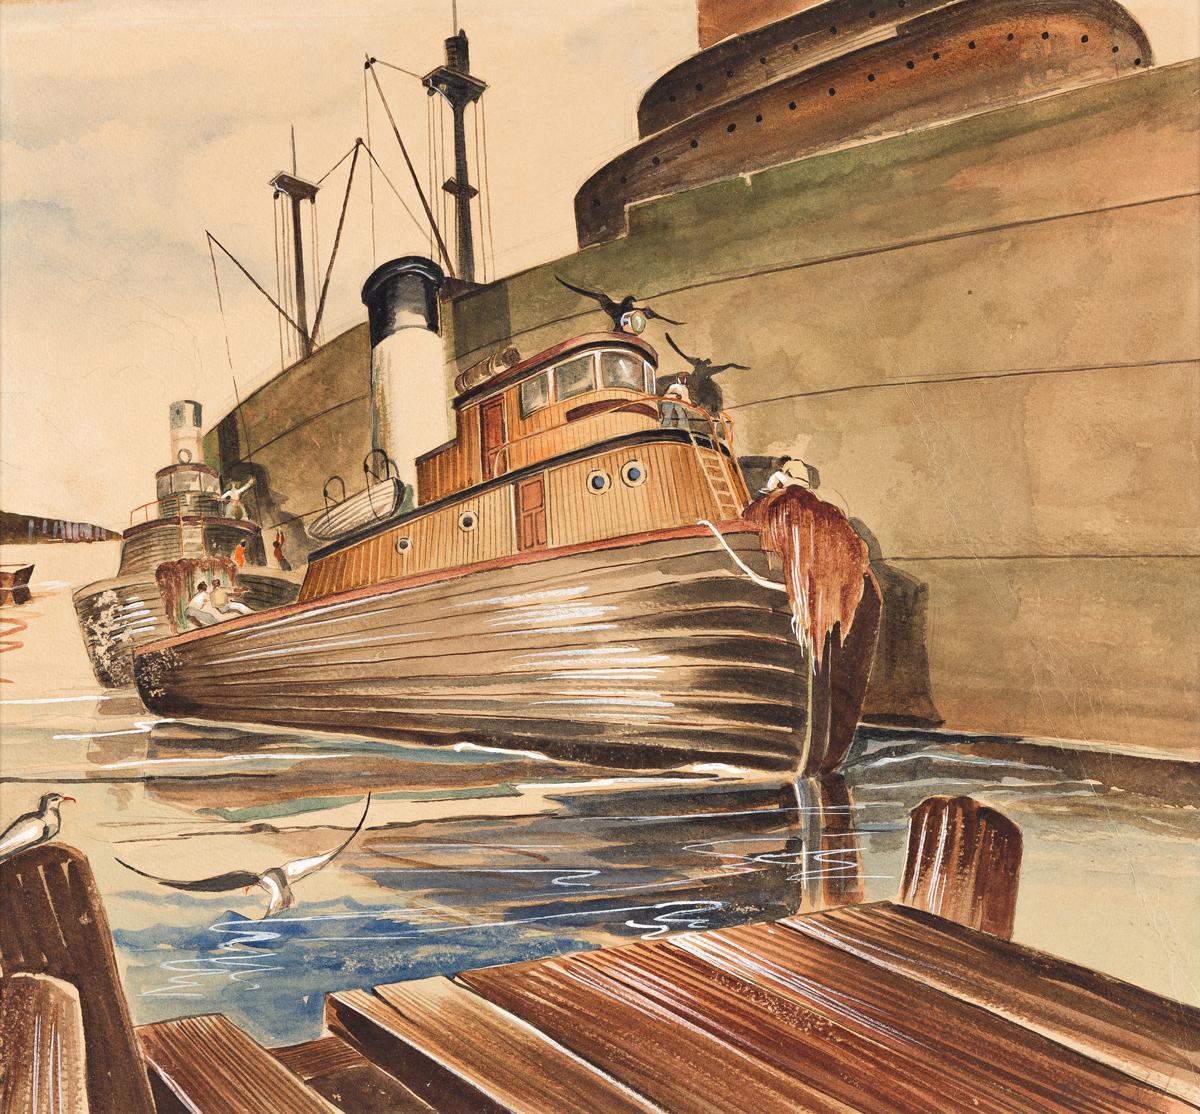 ROBERT NEAL (1916 - 1987) Untitled (Dock Scene).